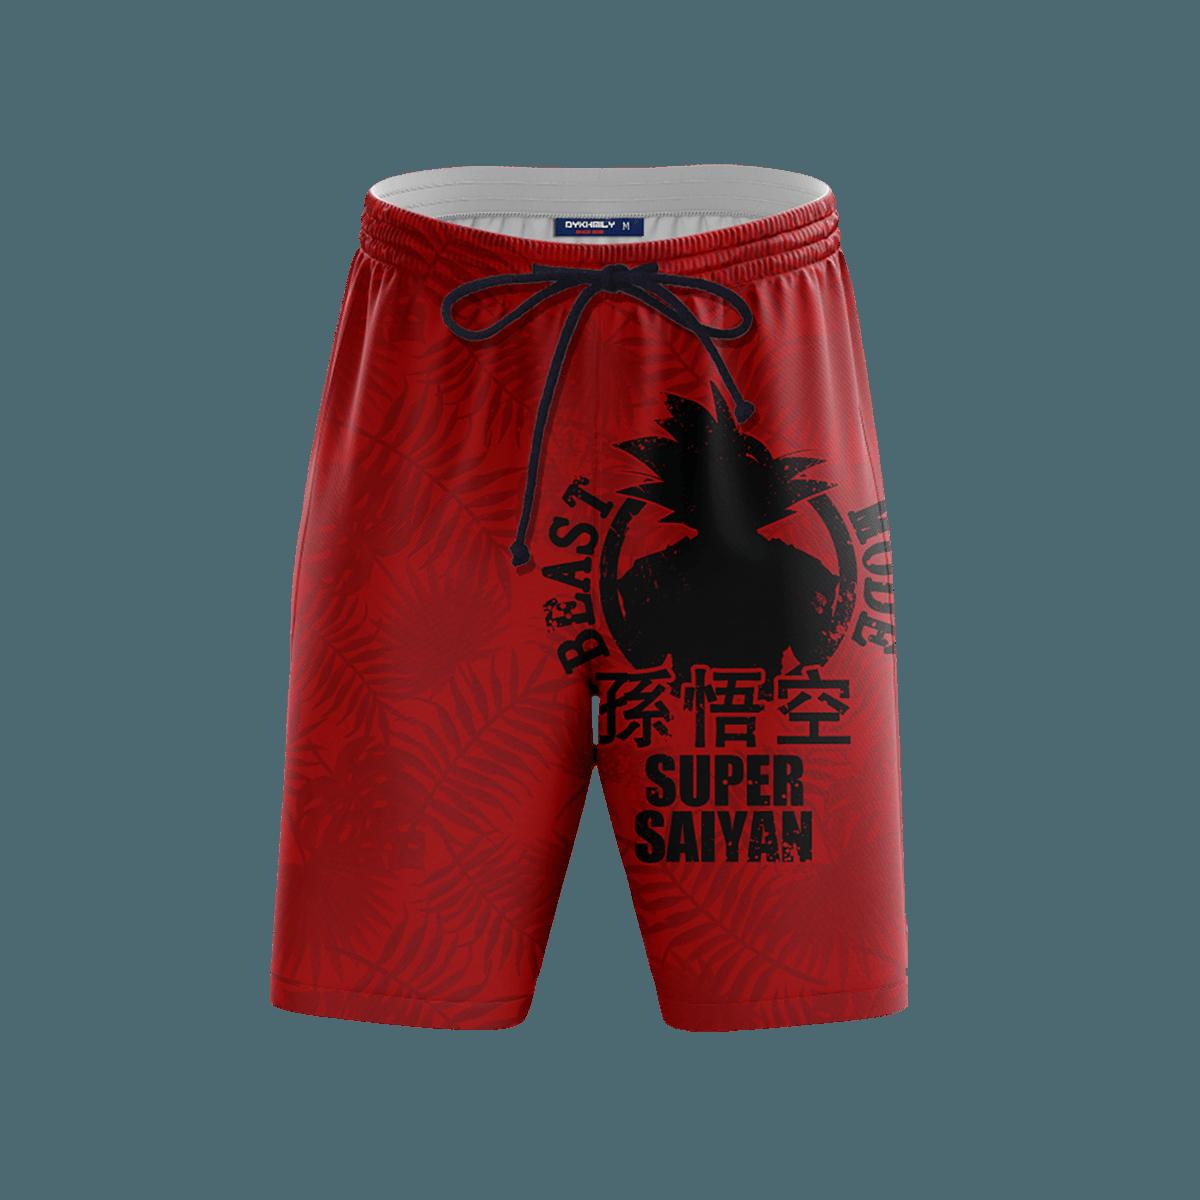 Super Saiyan Beach Shorts FDM3107 S Official Anime Swimsuit Merch